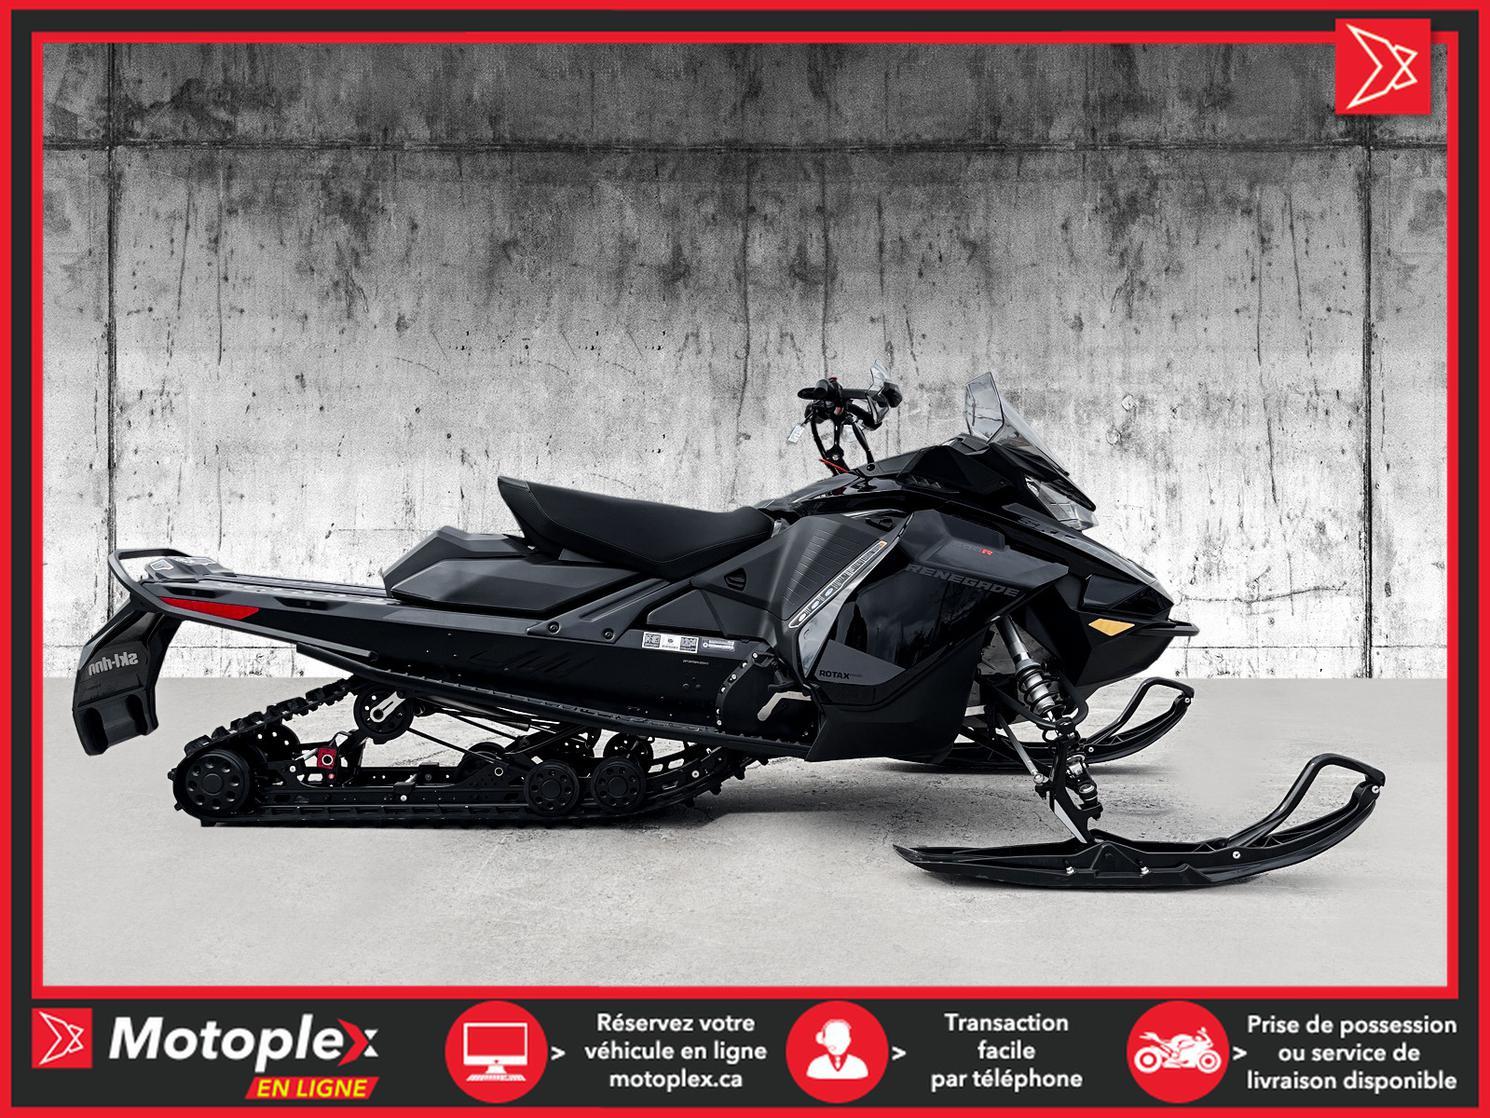 2021 Ski-Doo RENEGADE ADRENALINE  600 E-TEC 39$/SEMAINE